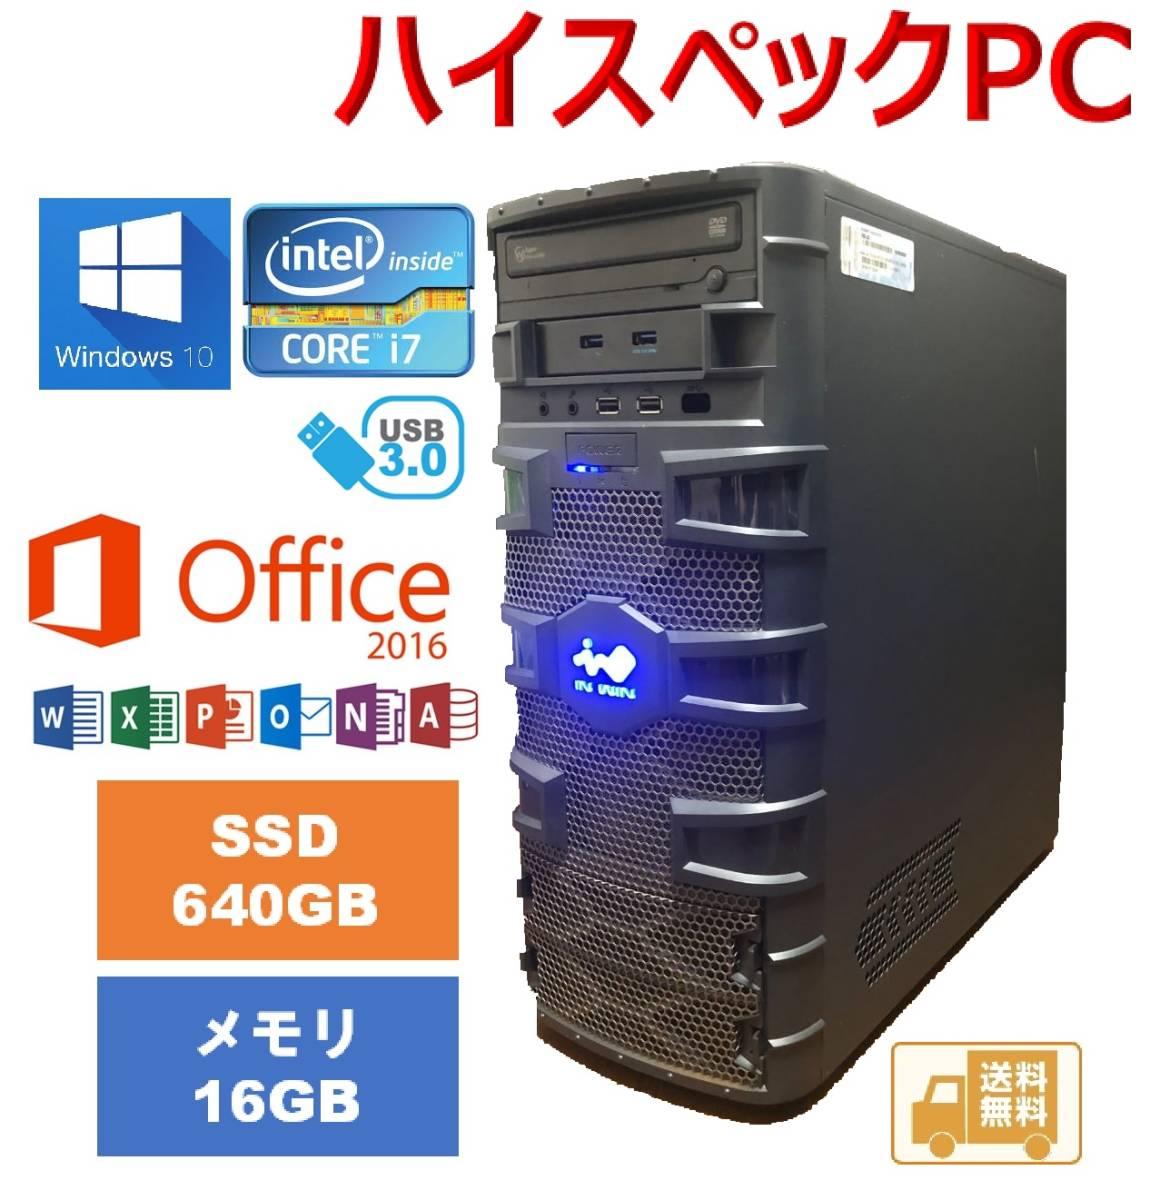 ▼超高速Intel Core i7 3.8GHz x 8▼大容量SSD640GB▼大容量メモリ16GB▼USB3.0▼最新Win10▼MS Office 2016▼自作▼